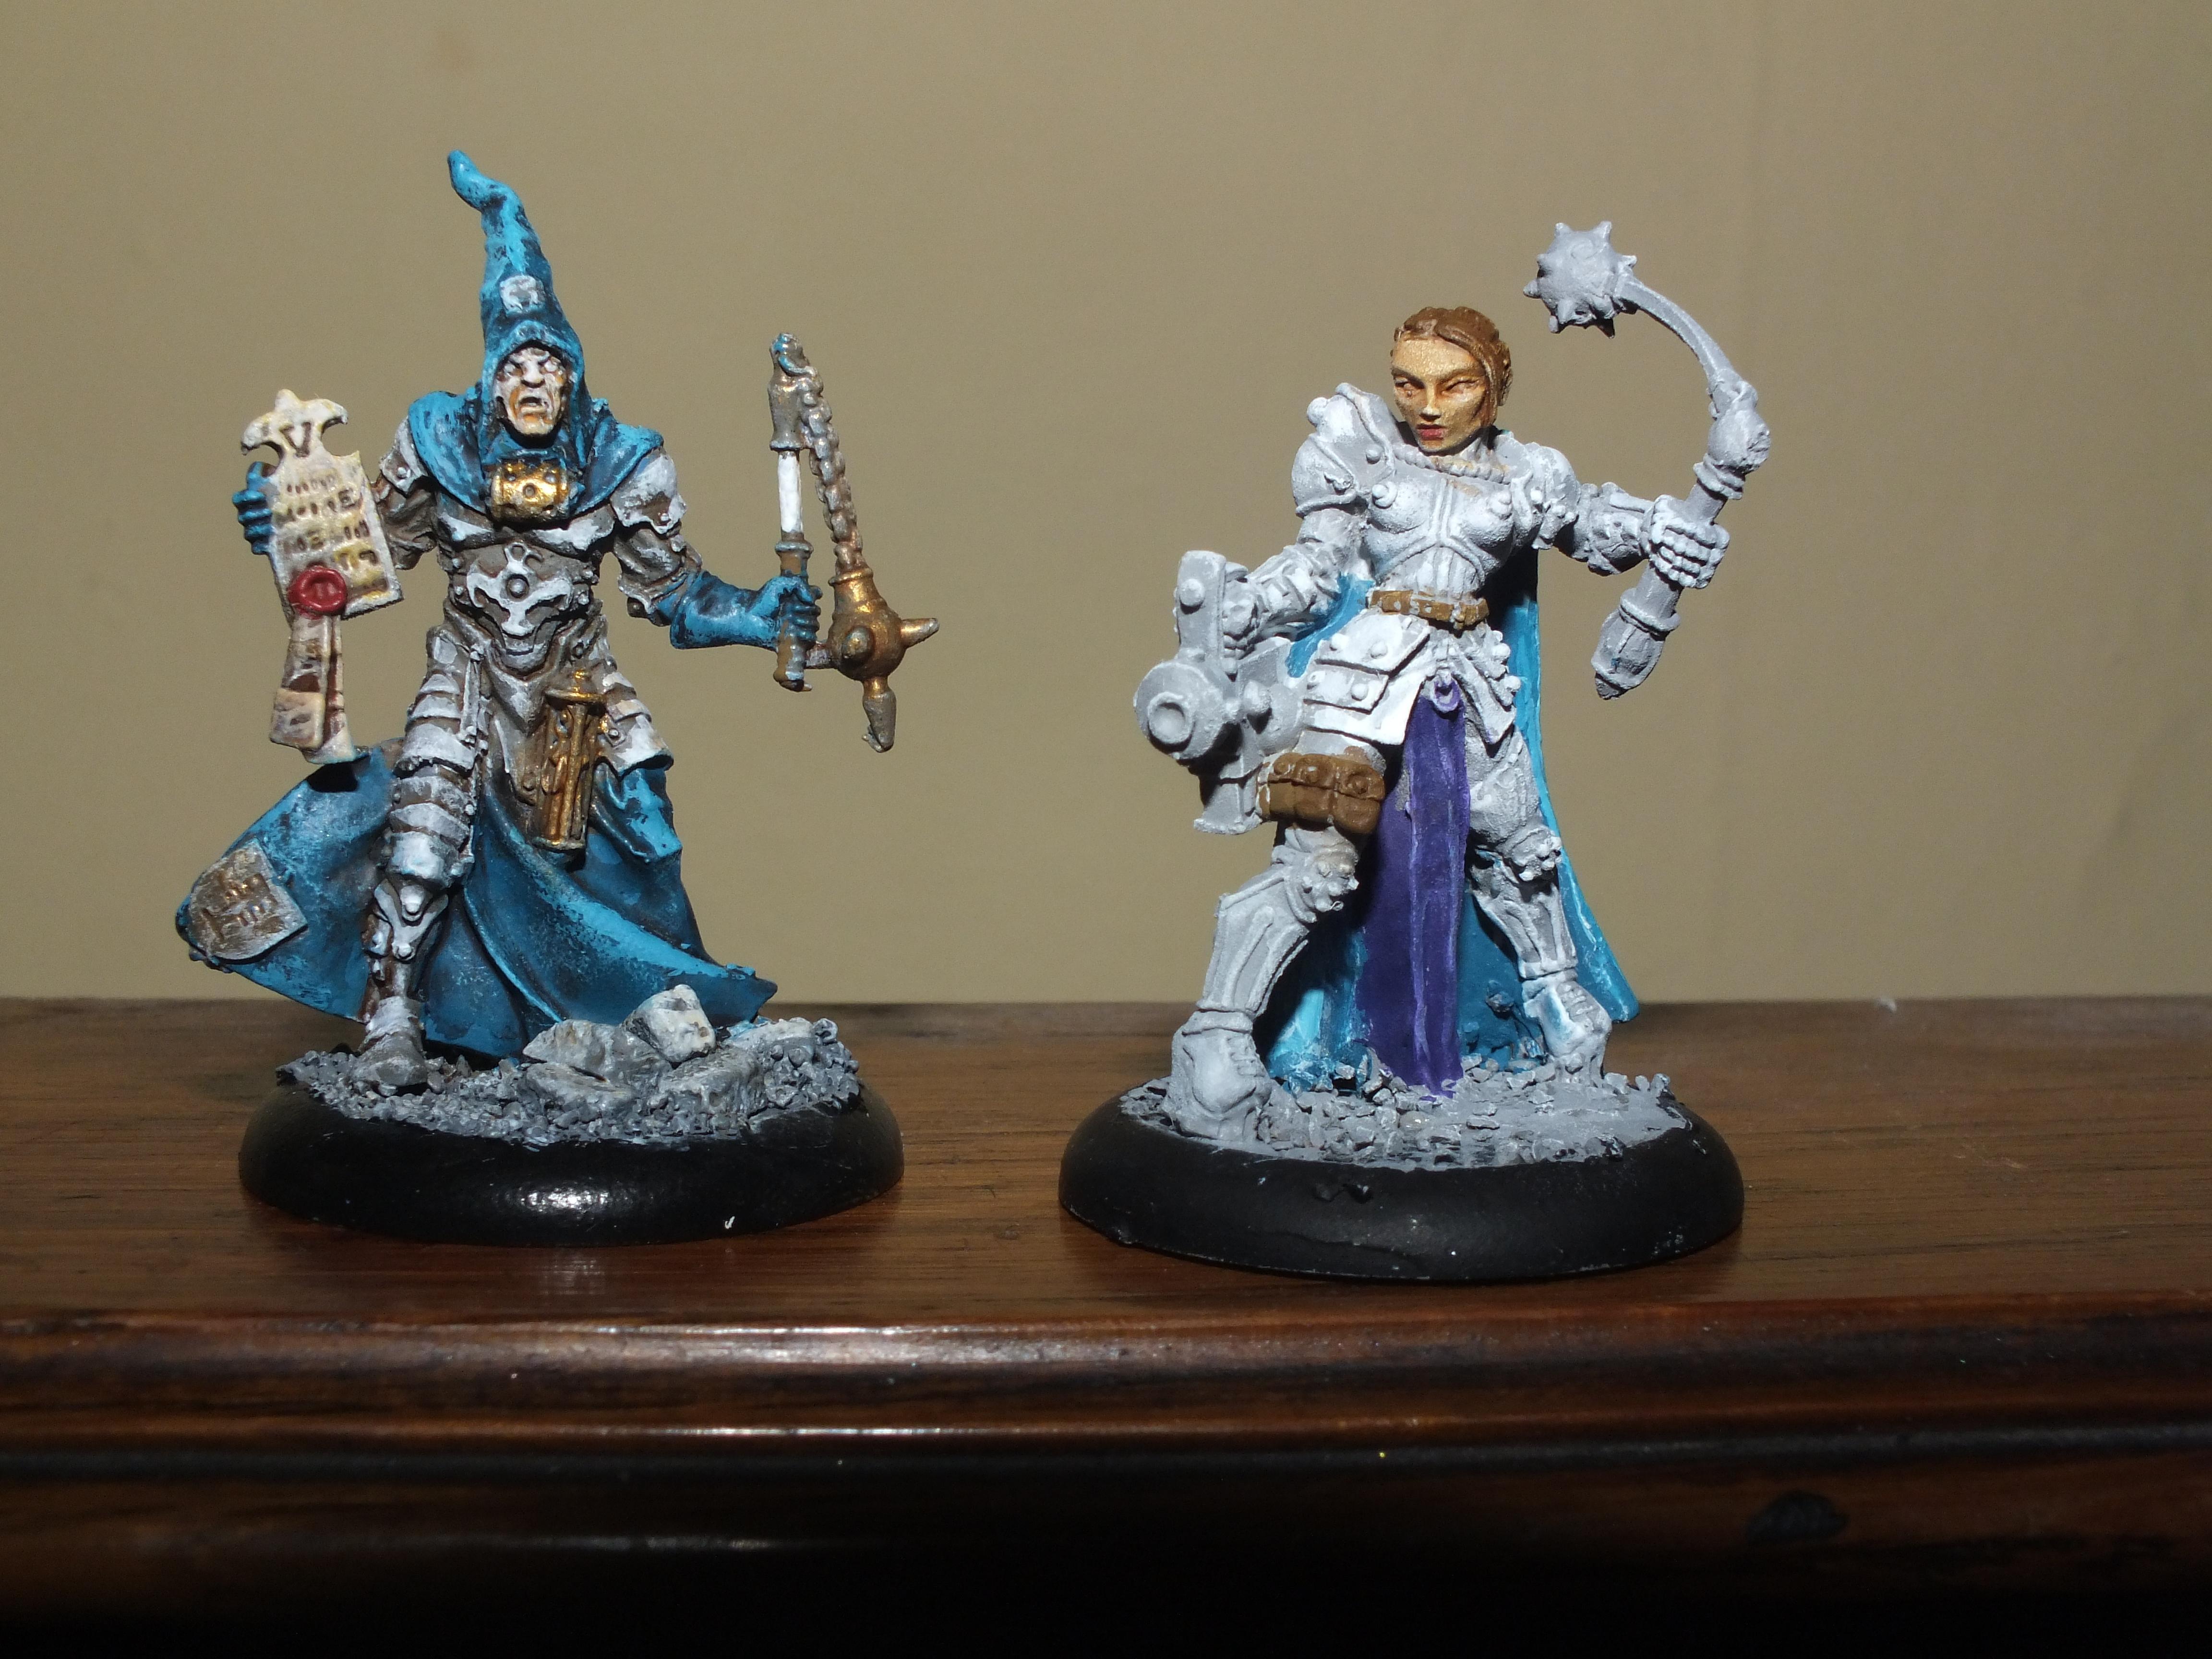 Sisters Of Battle, Acolyte and Kyrinova